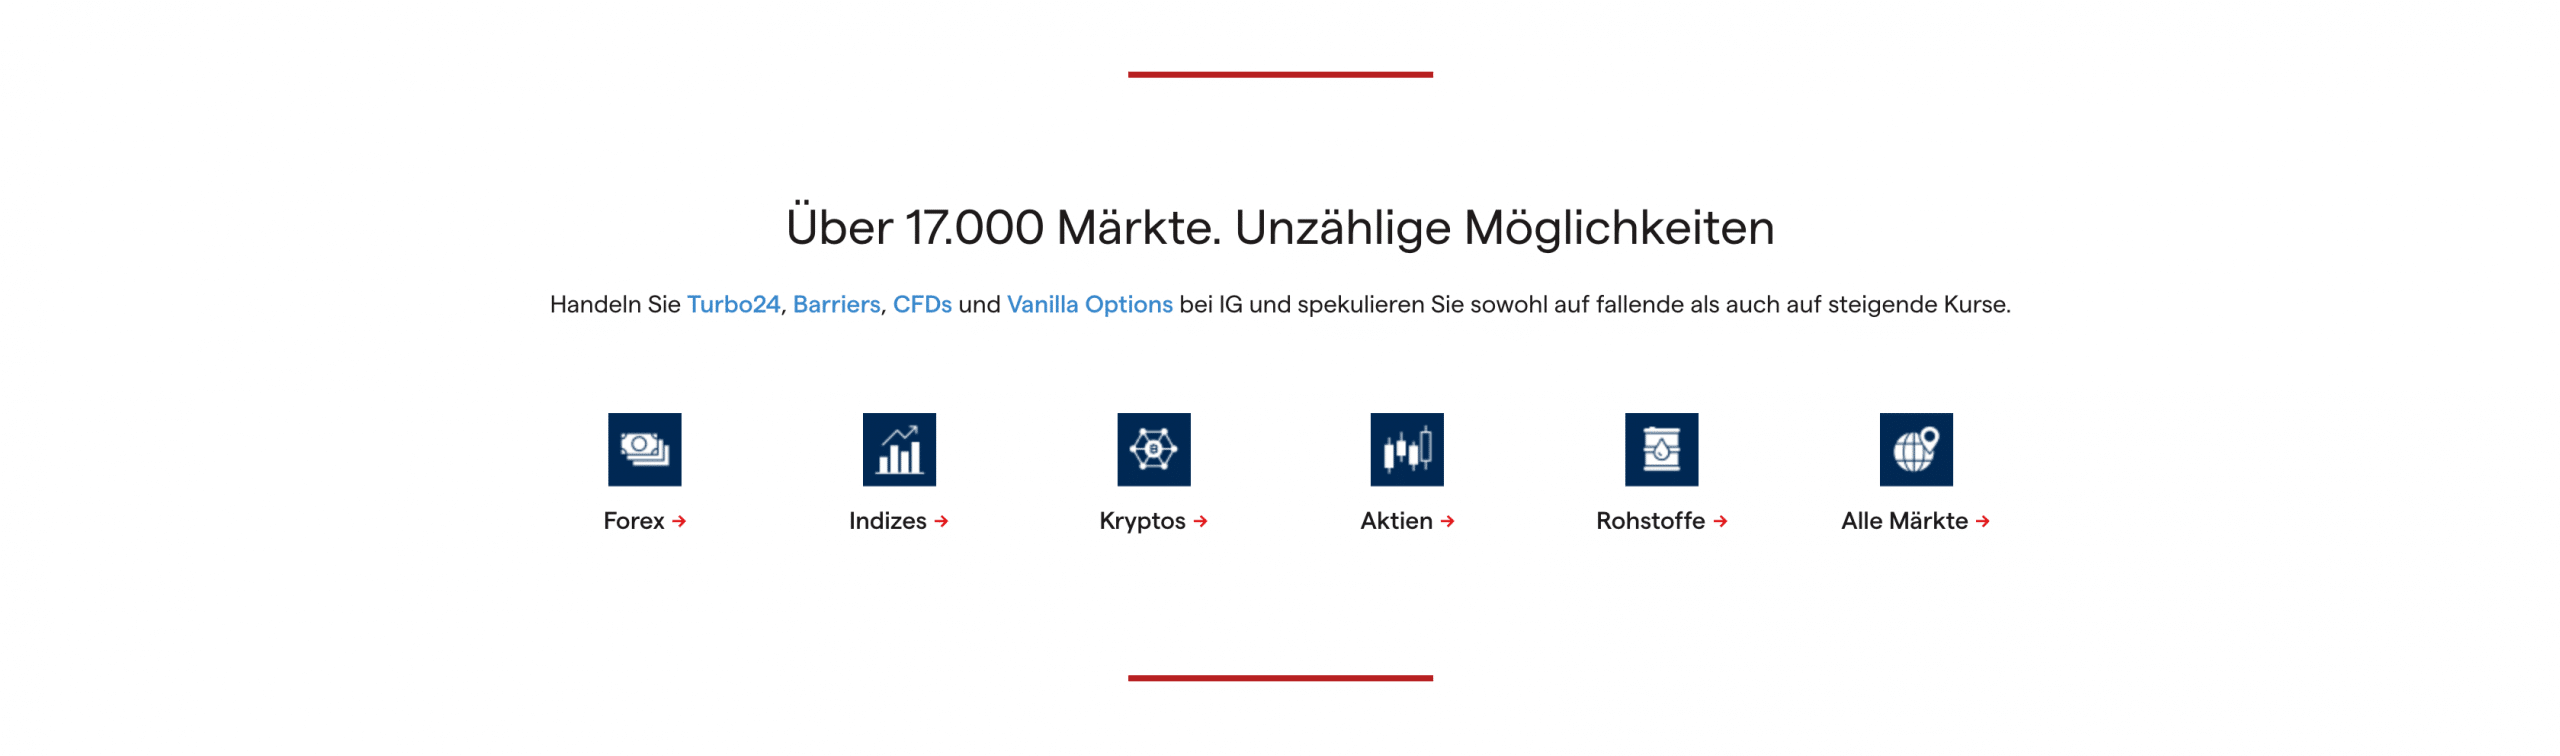 IG Markets Angebot